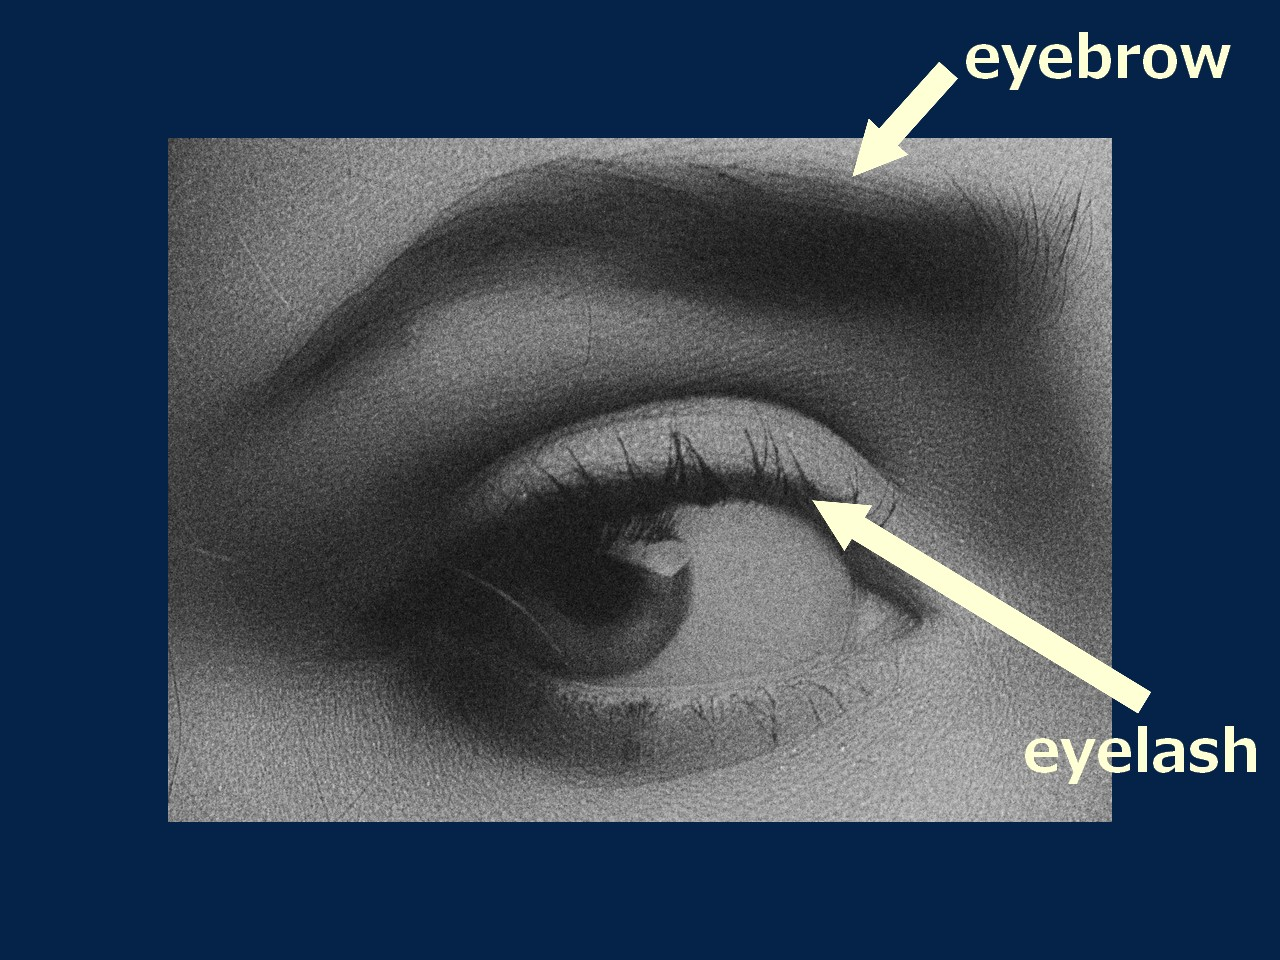 eyebrow / eyelash / eyelid の意味と簡単な区別の仕方